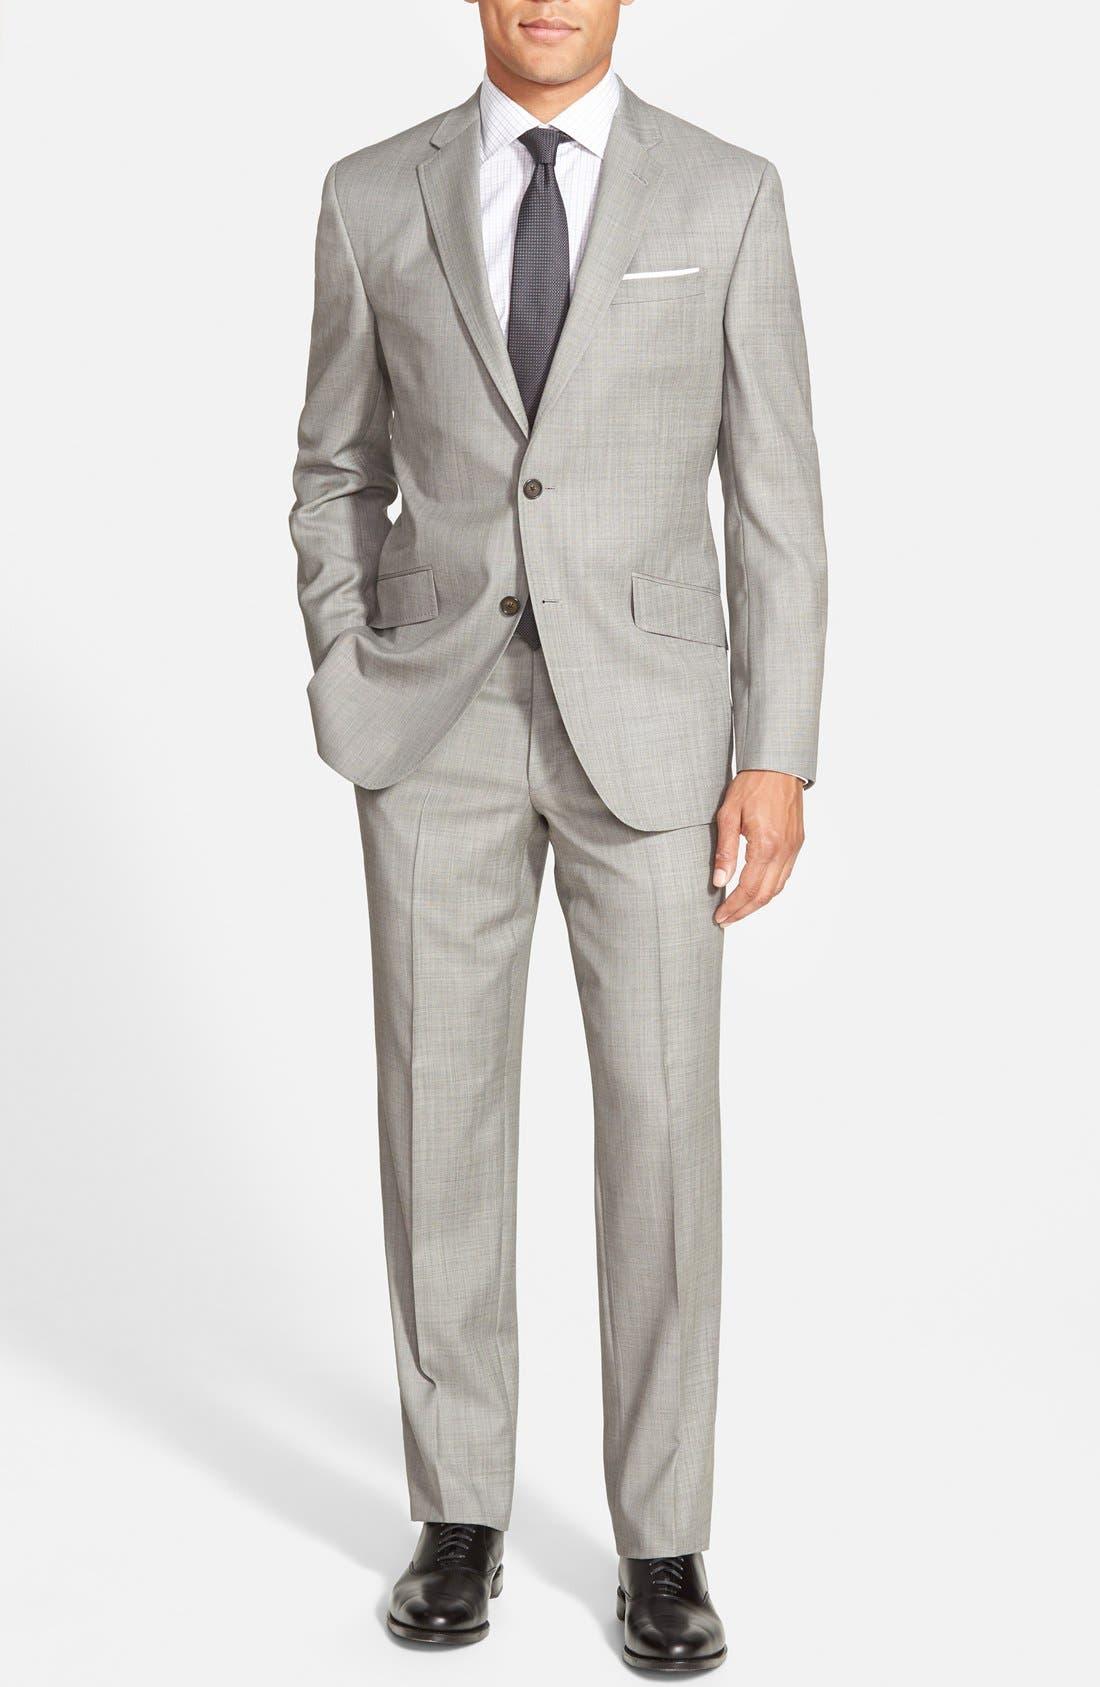 Jones Trim Fit Wool Suit,                             Main thumbnail 1, color,                             Medium Grey